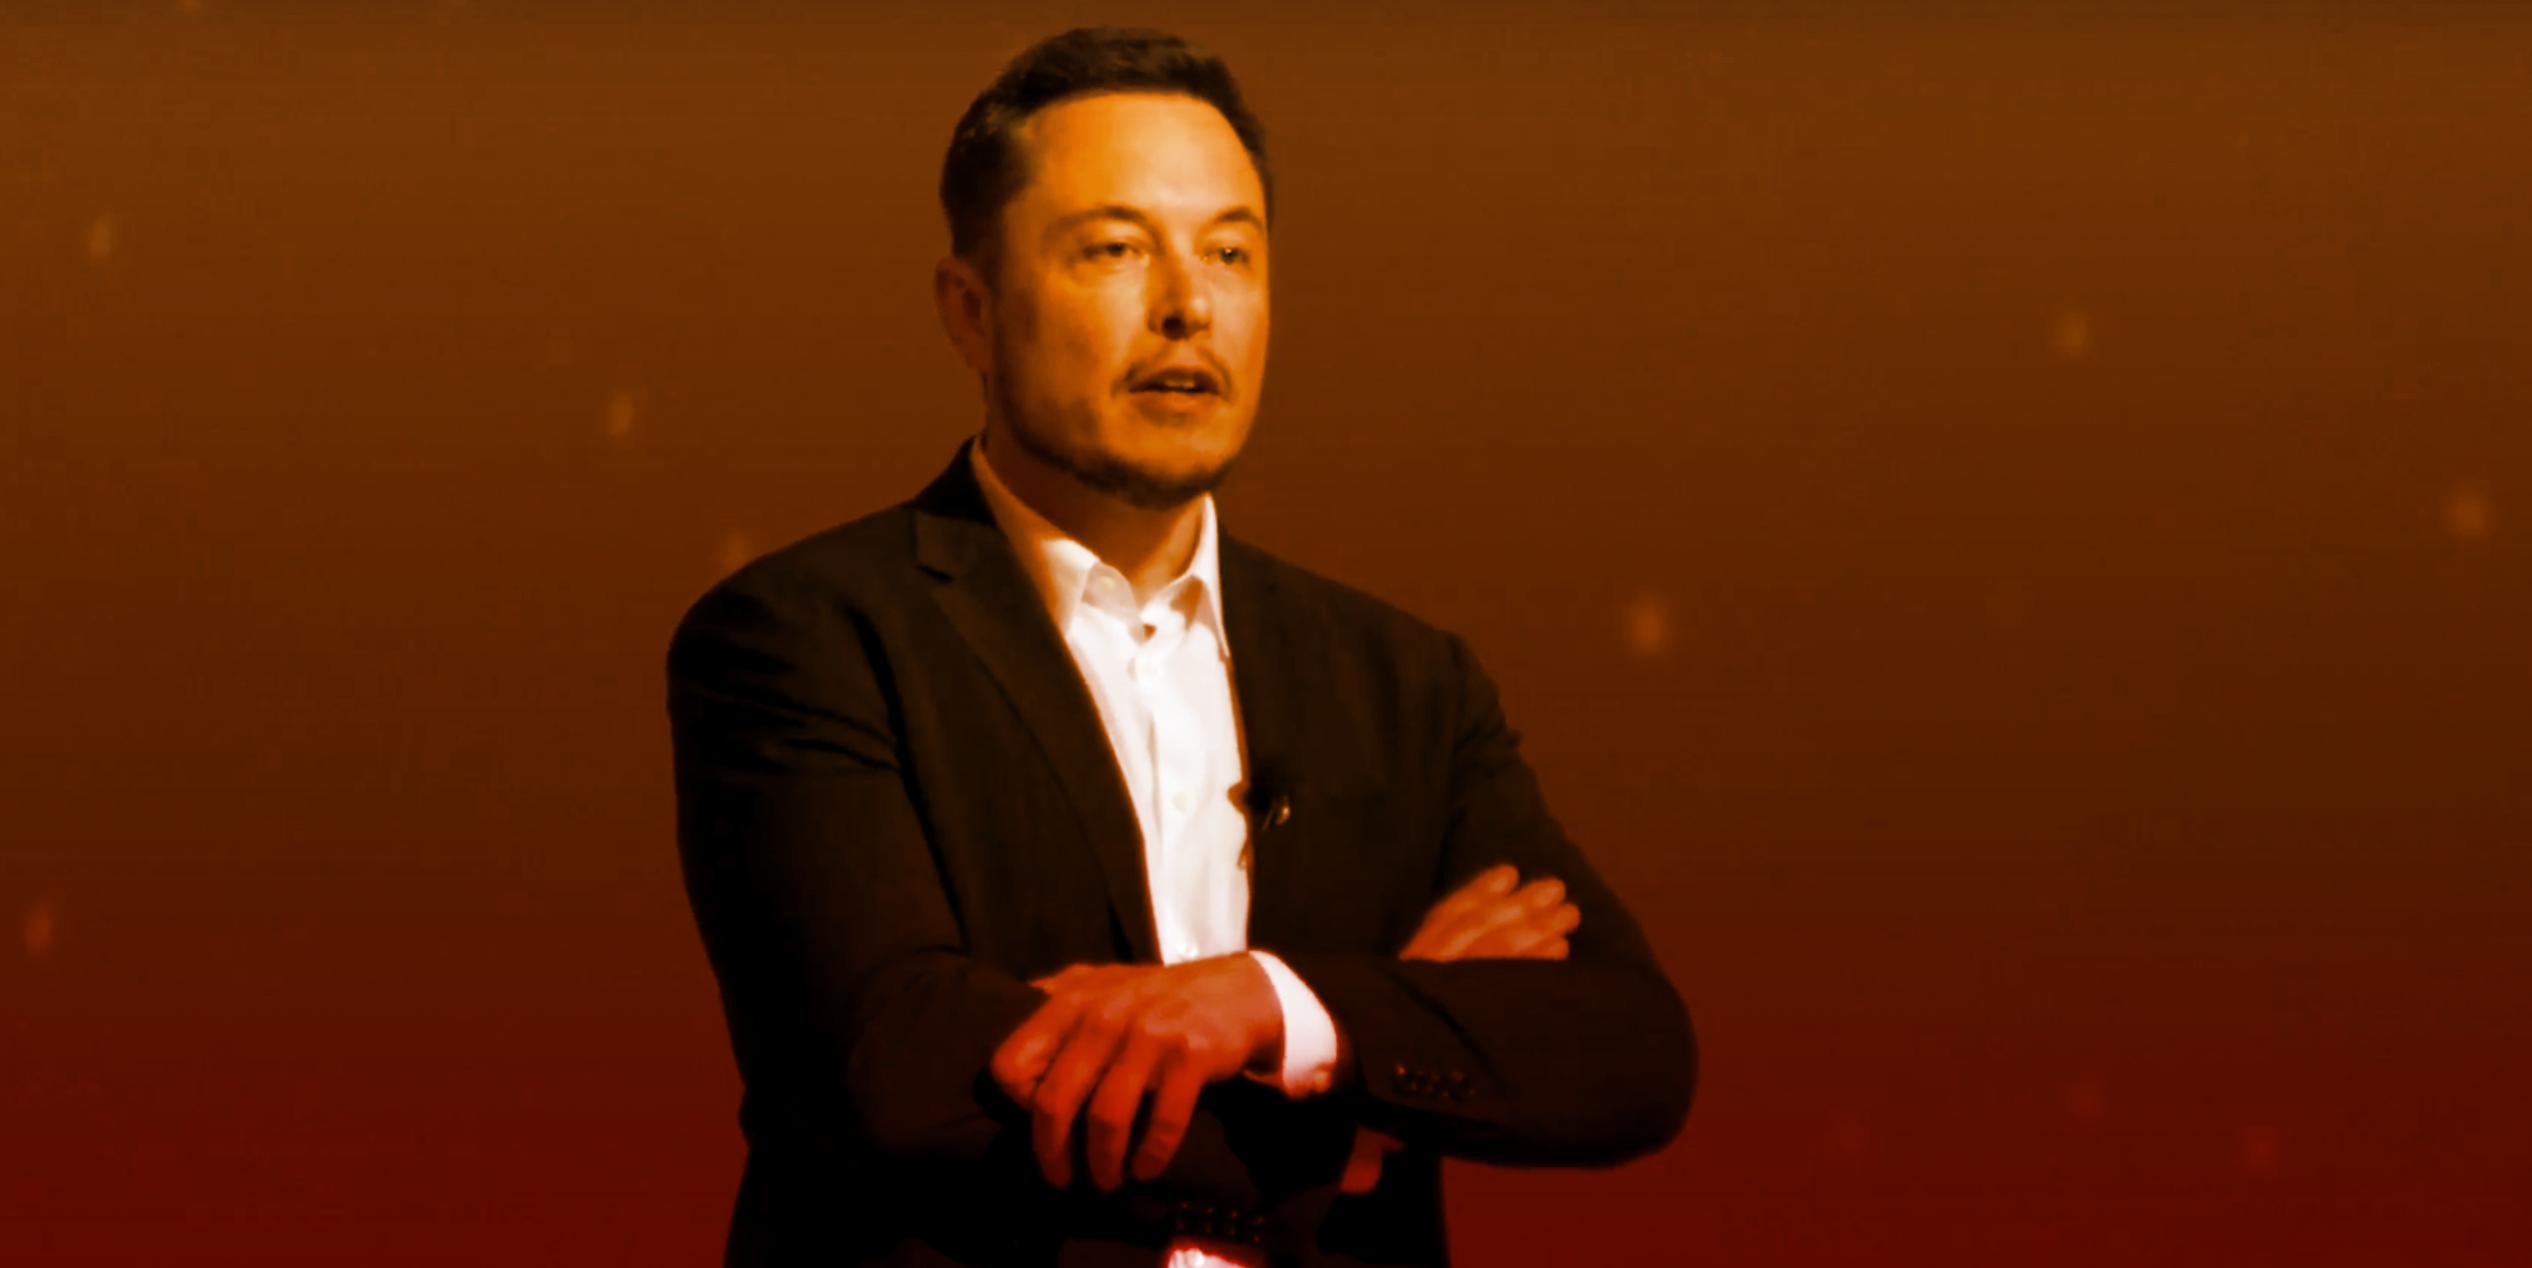 Elon Musk's SpaceX presentation.